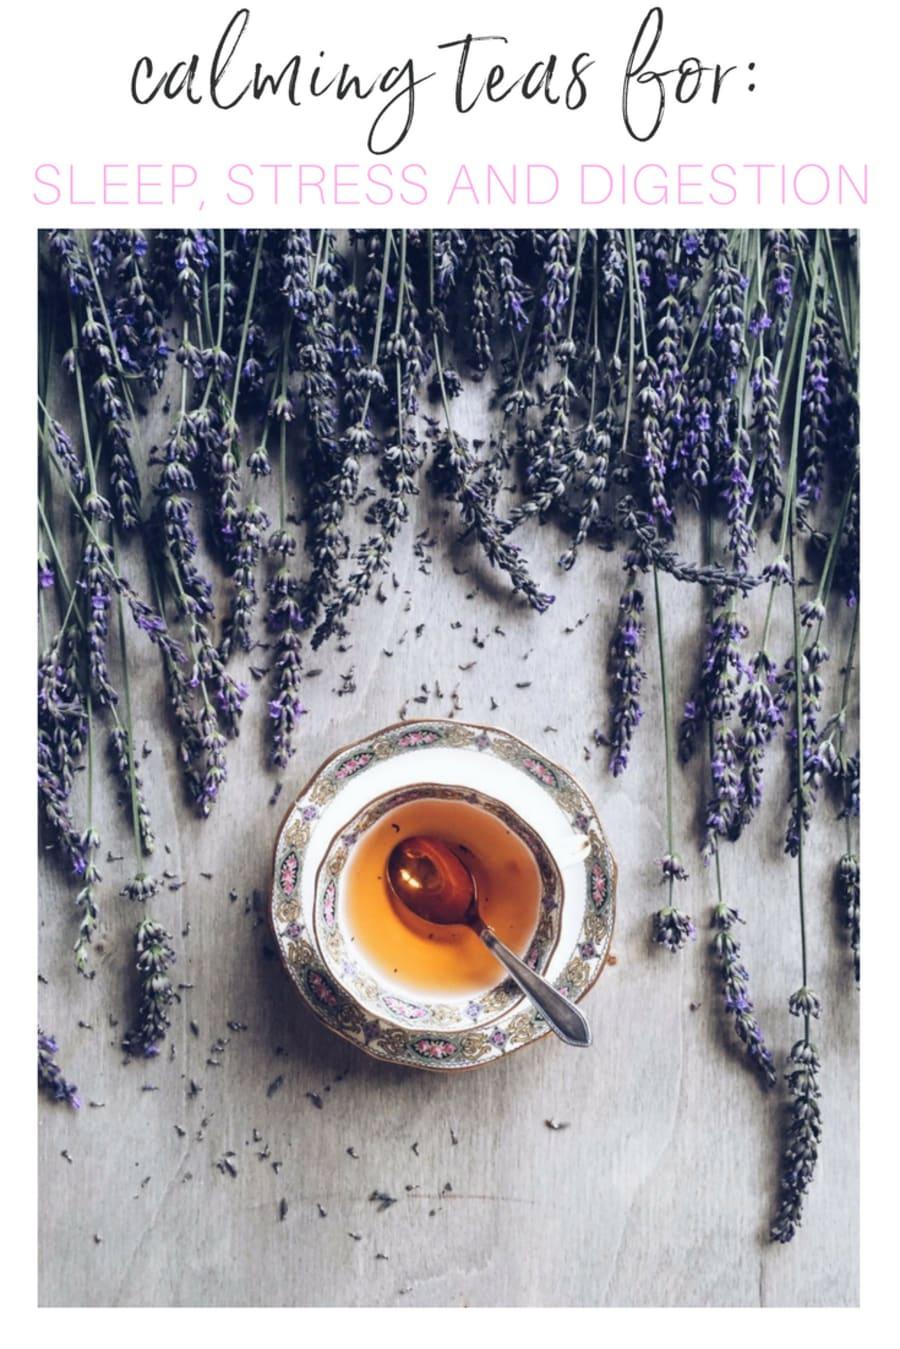 Calming Teas For Sleep Stress And Digestion Huffpost Australia Zoe Powder Mix Green Tea Getty